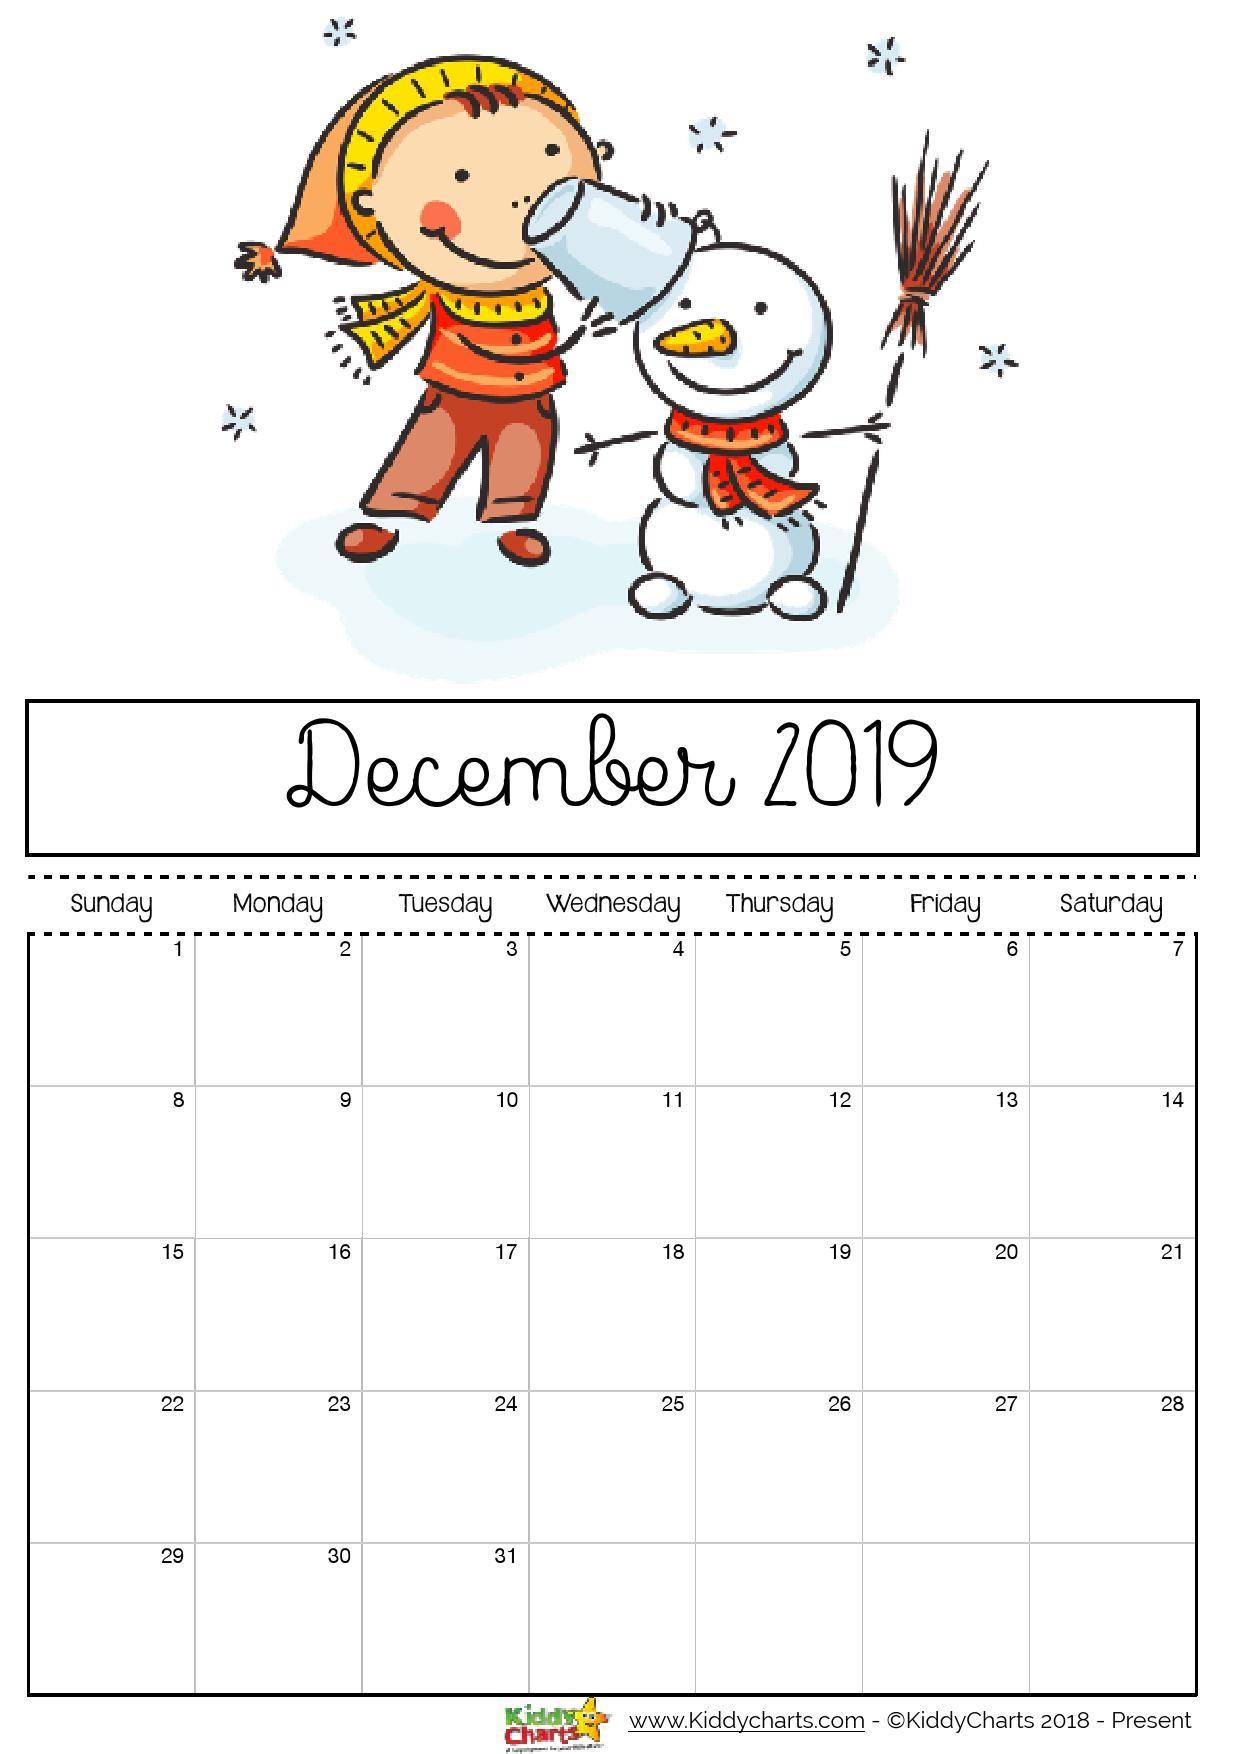 December Calendar 2019 Printable Free Printable 2019 Calendar Print Yours Here